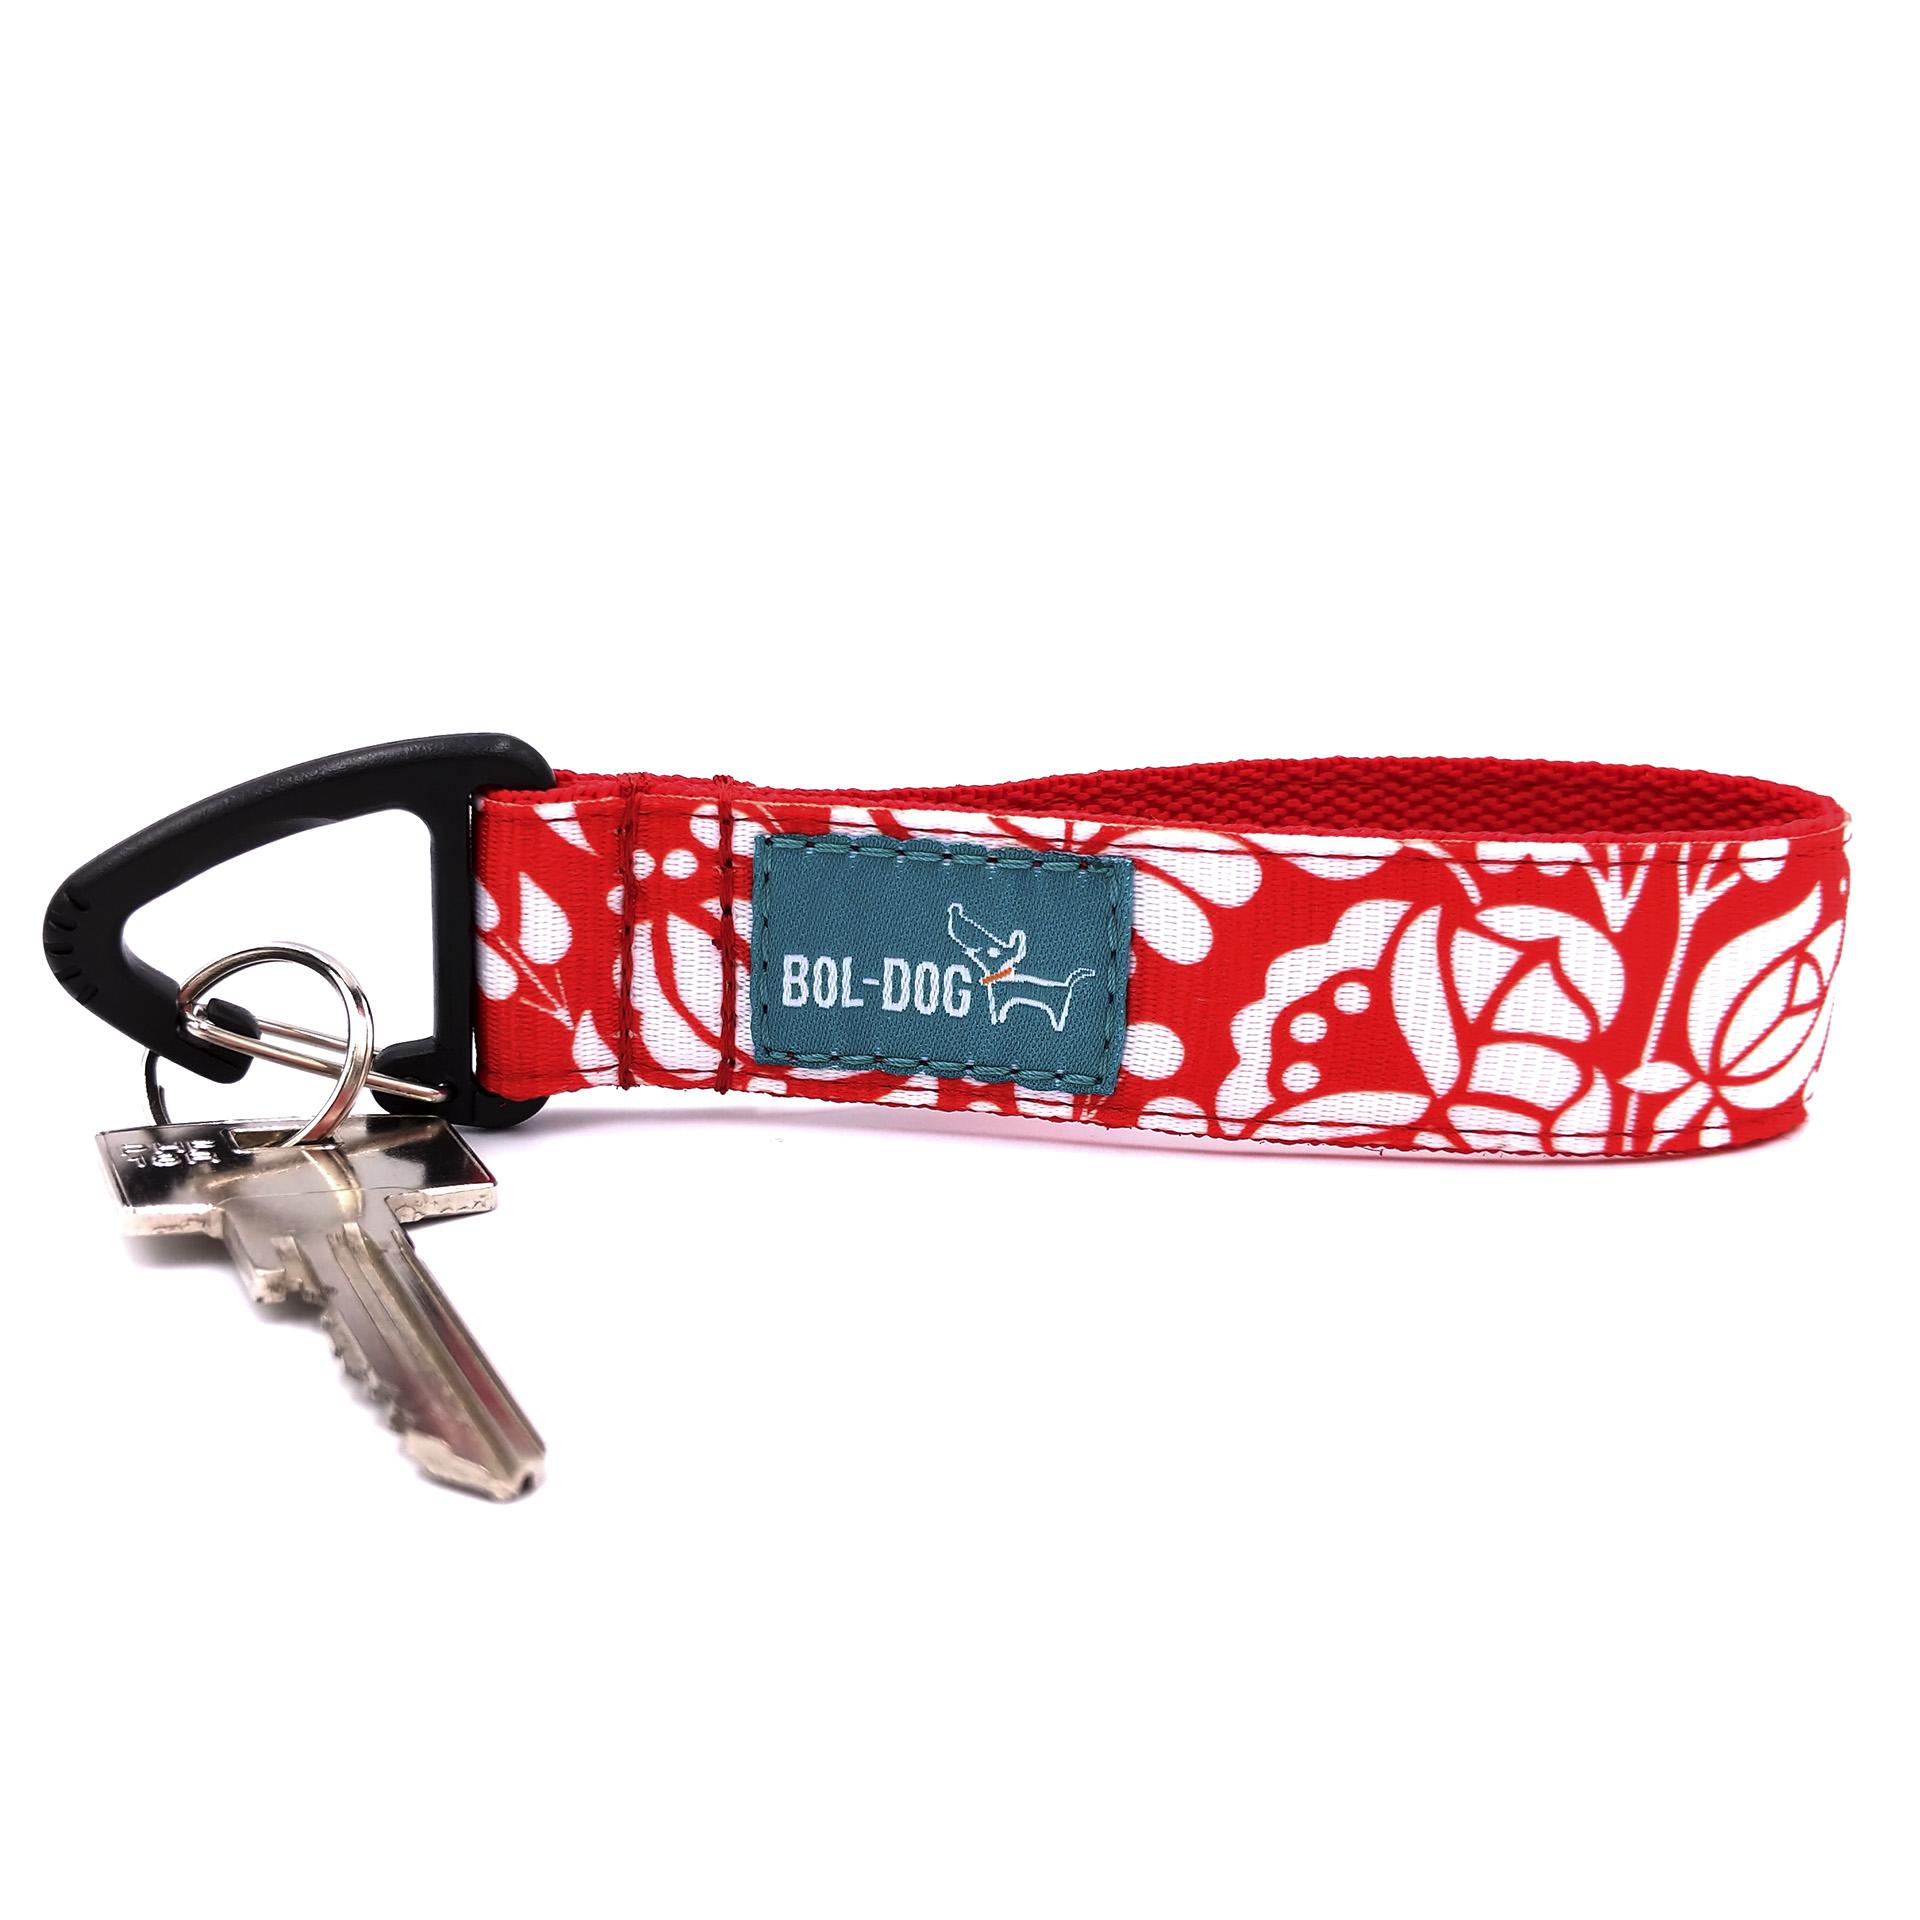 Heritage key holder